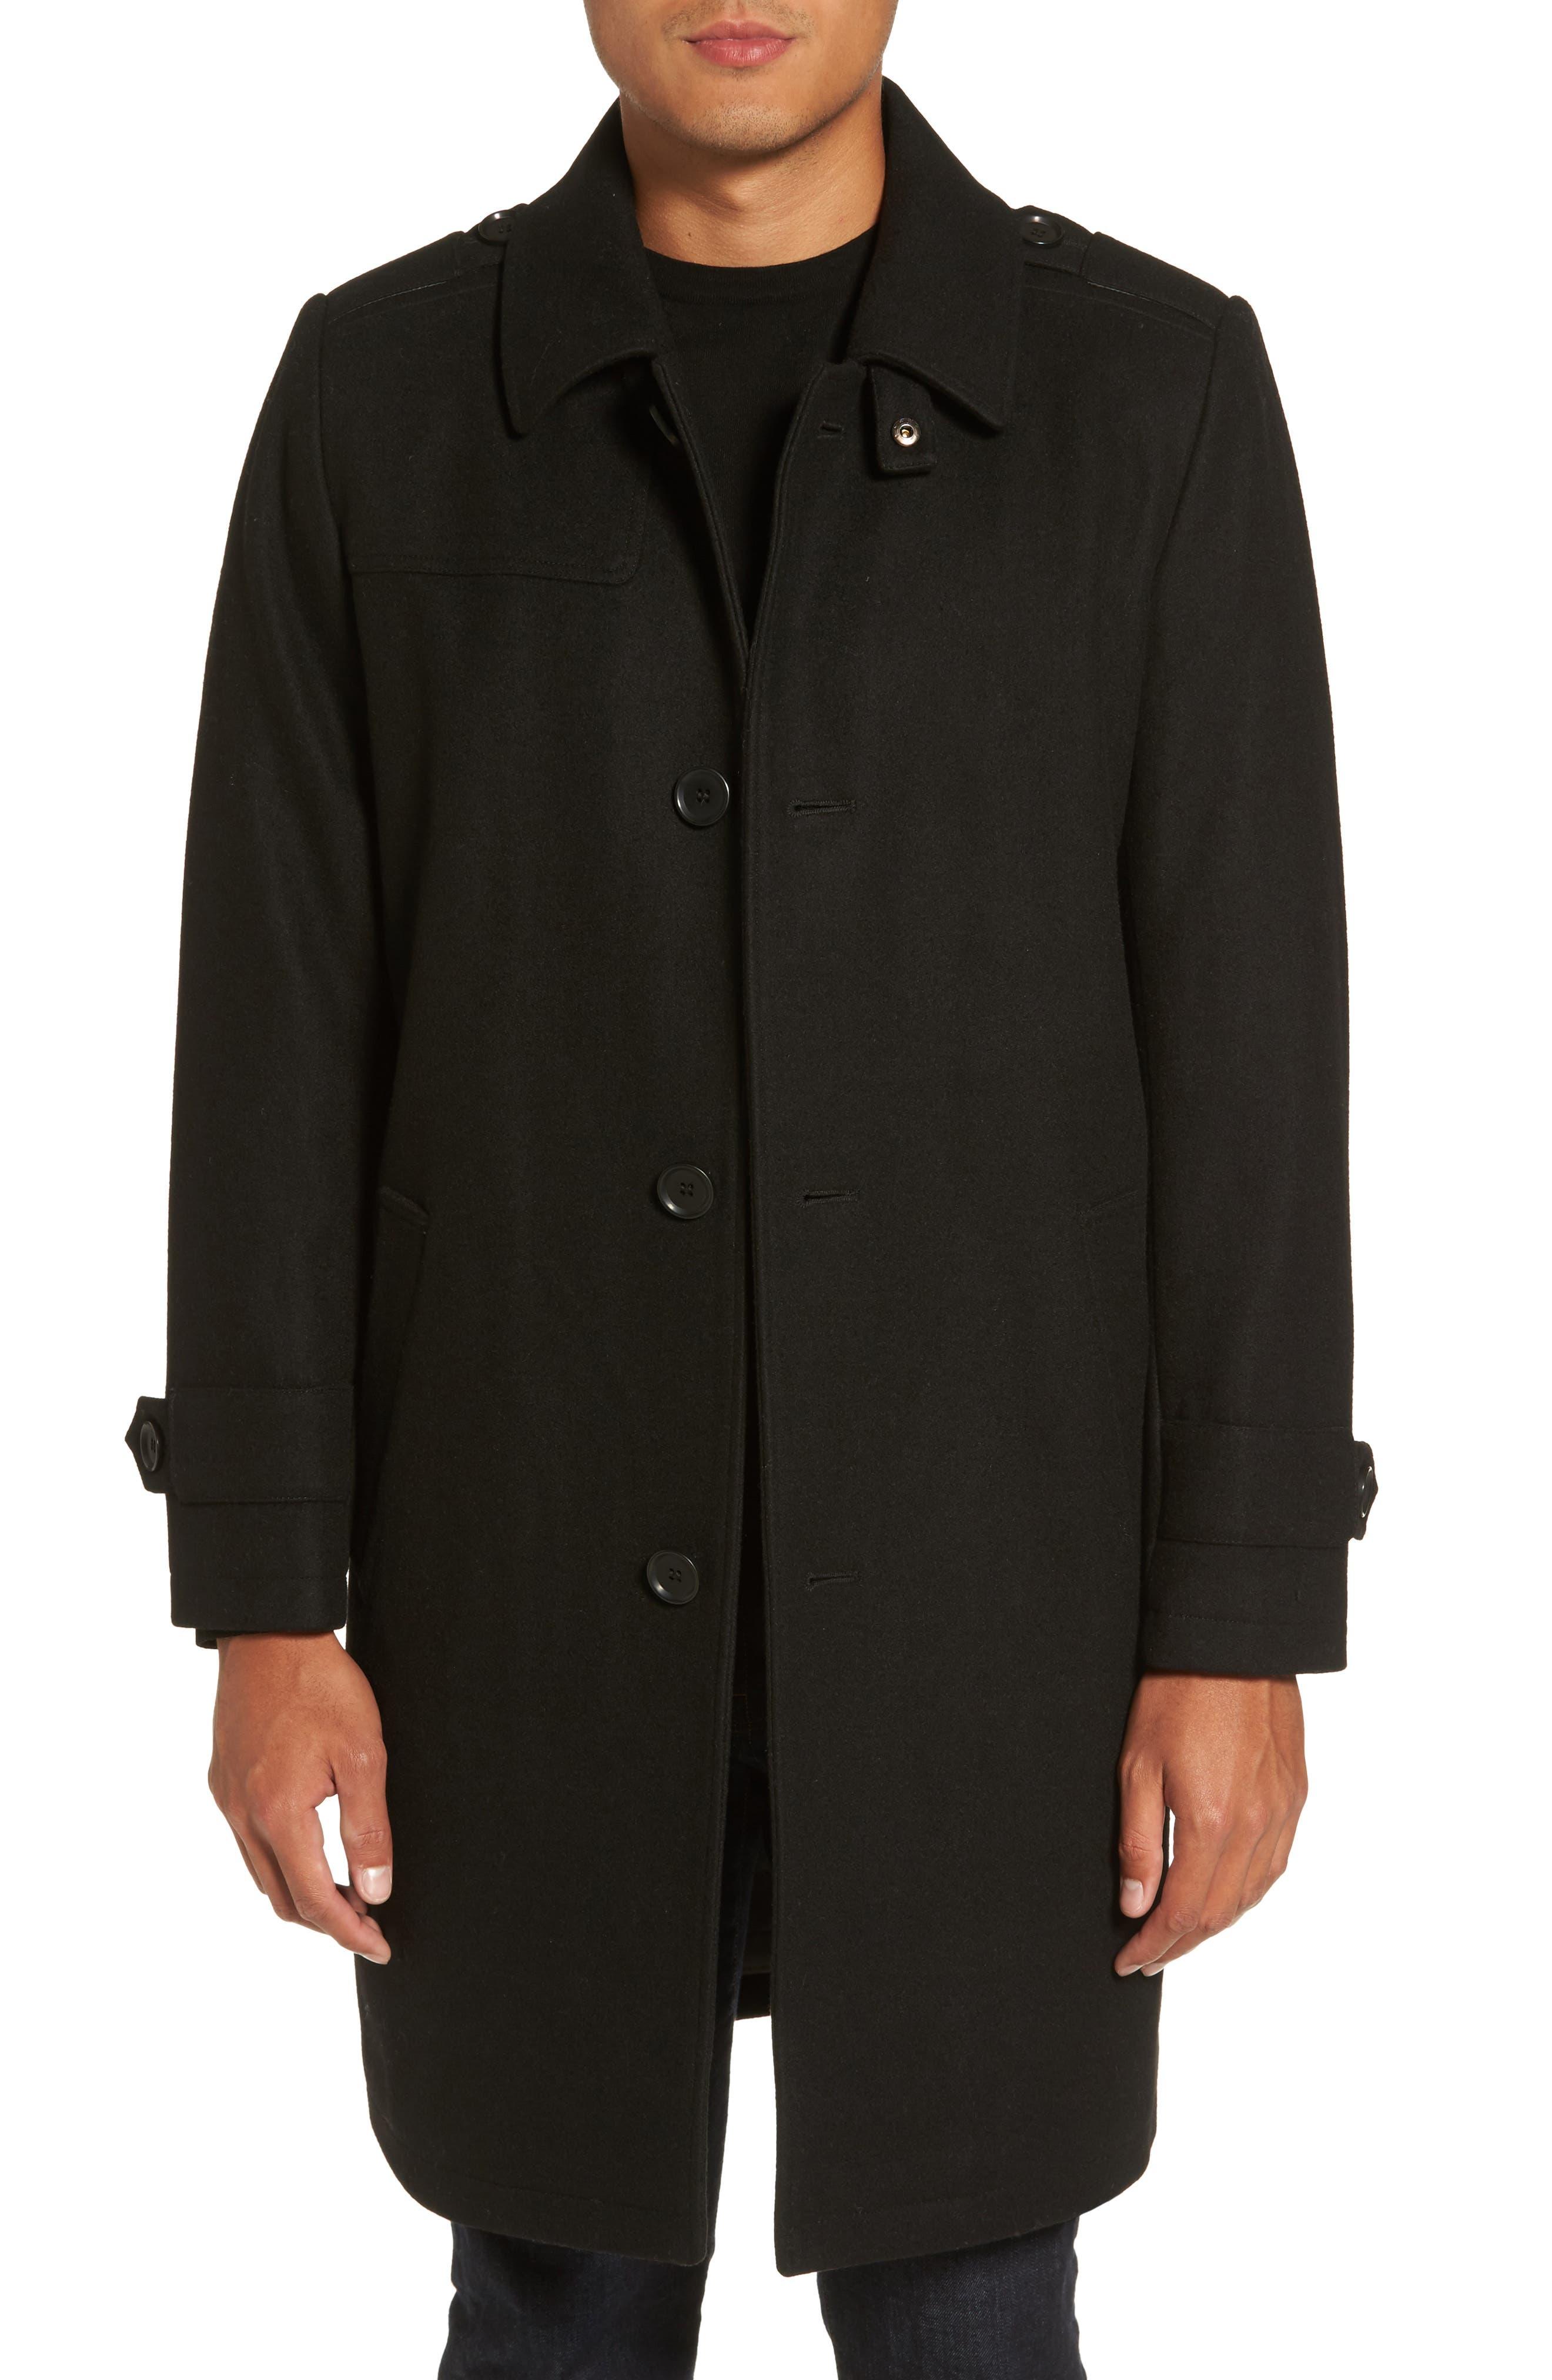 Wool Blend Overcoat,                             Main thumbnail 1, color,                             001